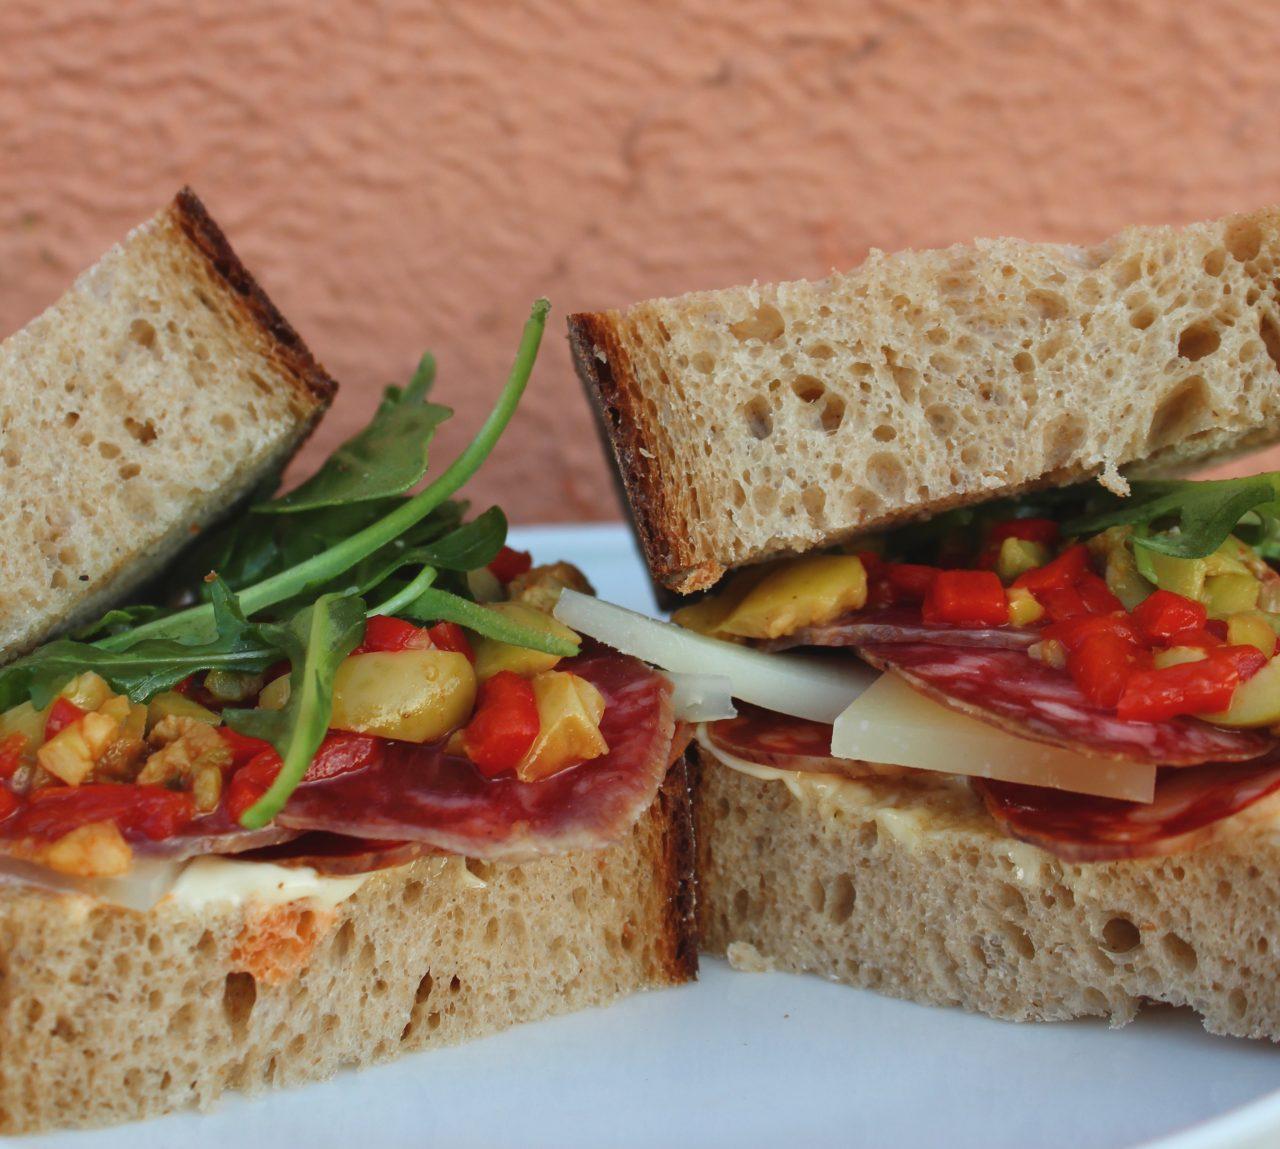 The Finest Iberian Sandwich   Sanduche de Jamon Iberico